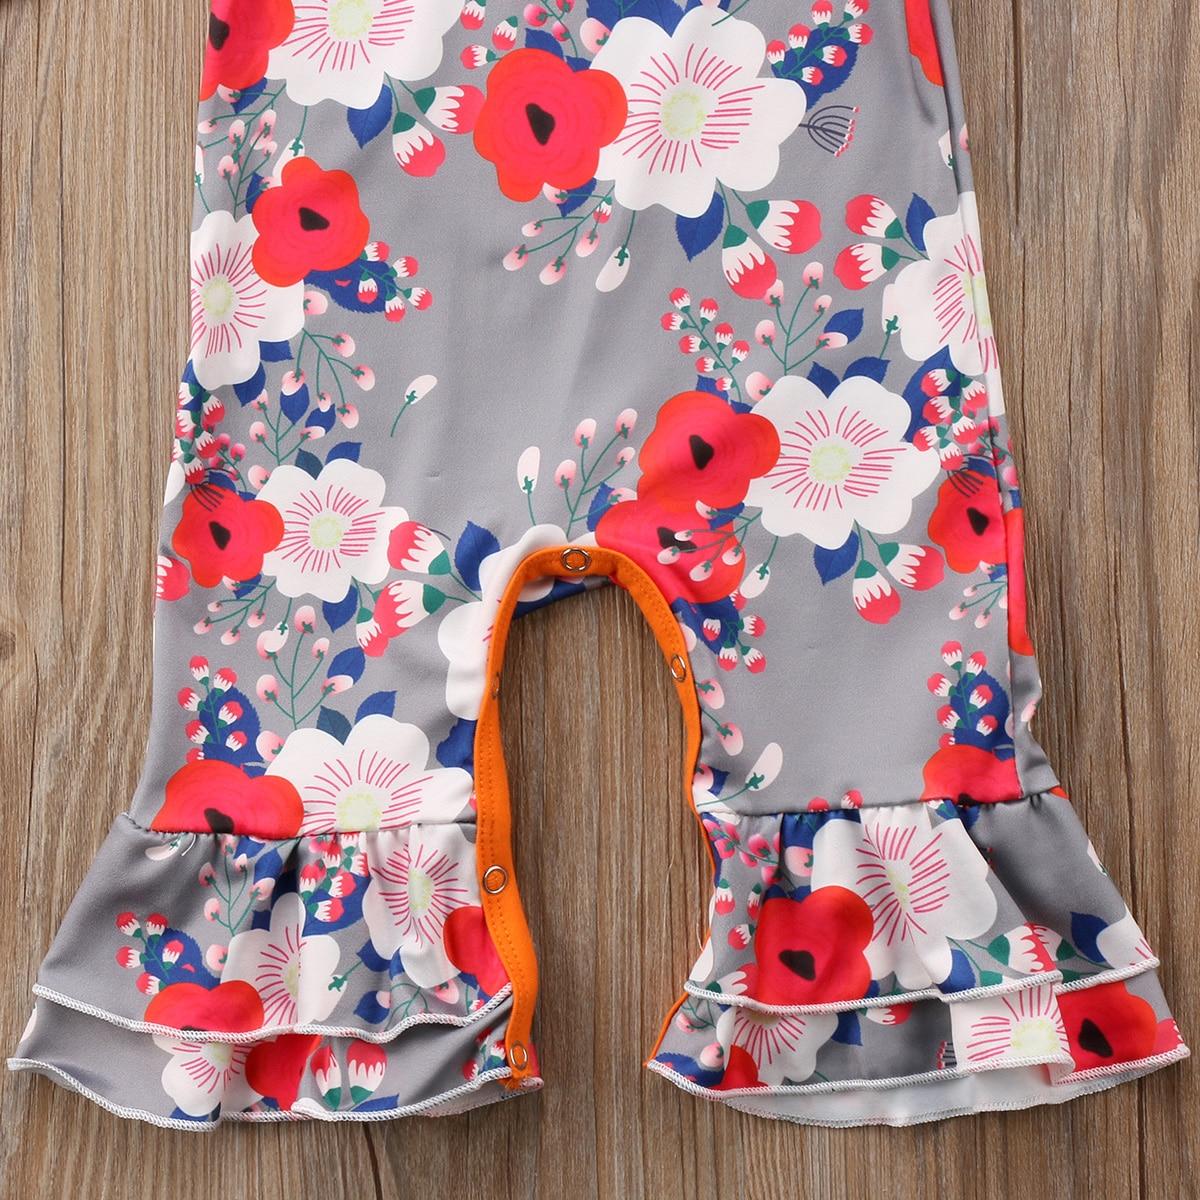 Fashion newborn baby girl clothes 91